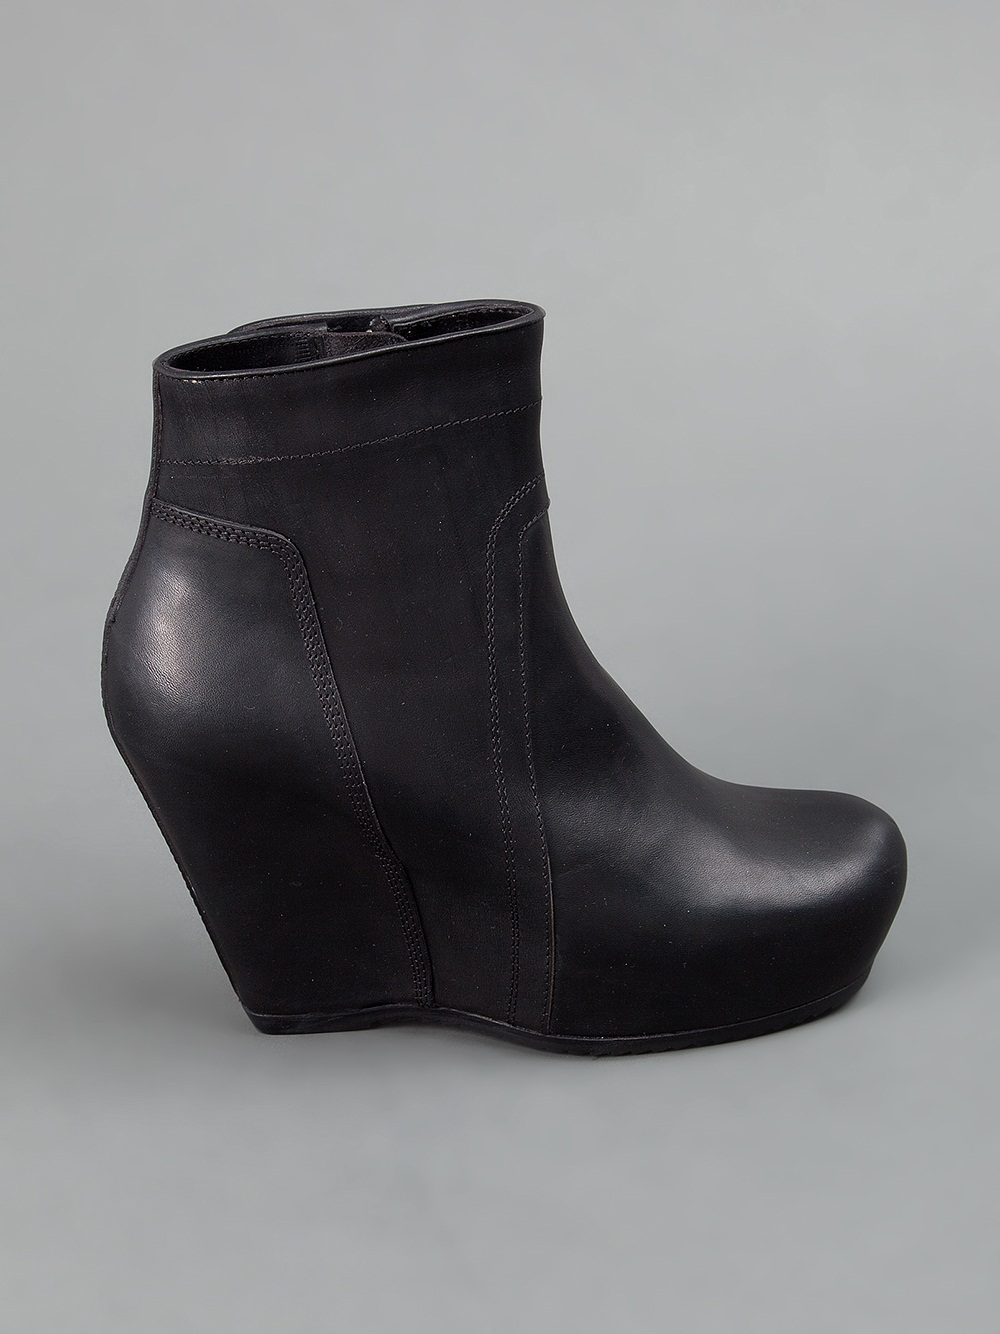 rick owens wedge boot in black lyst